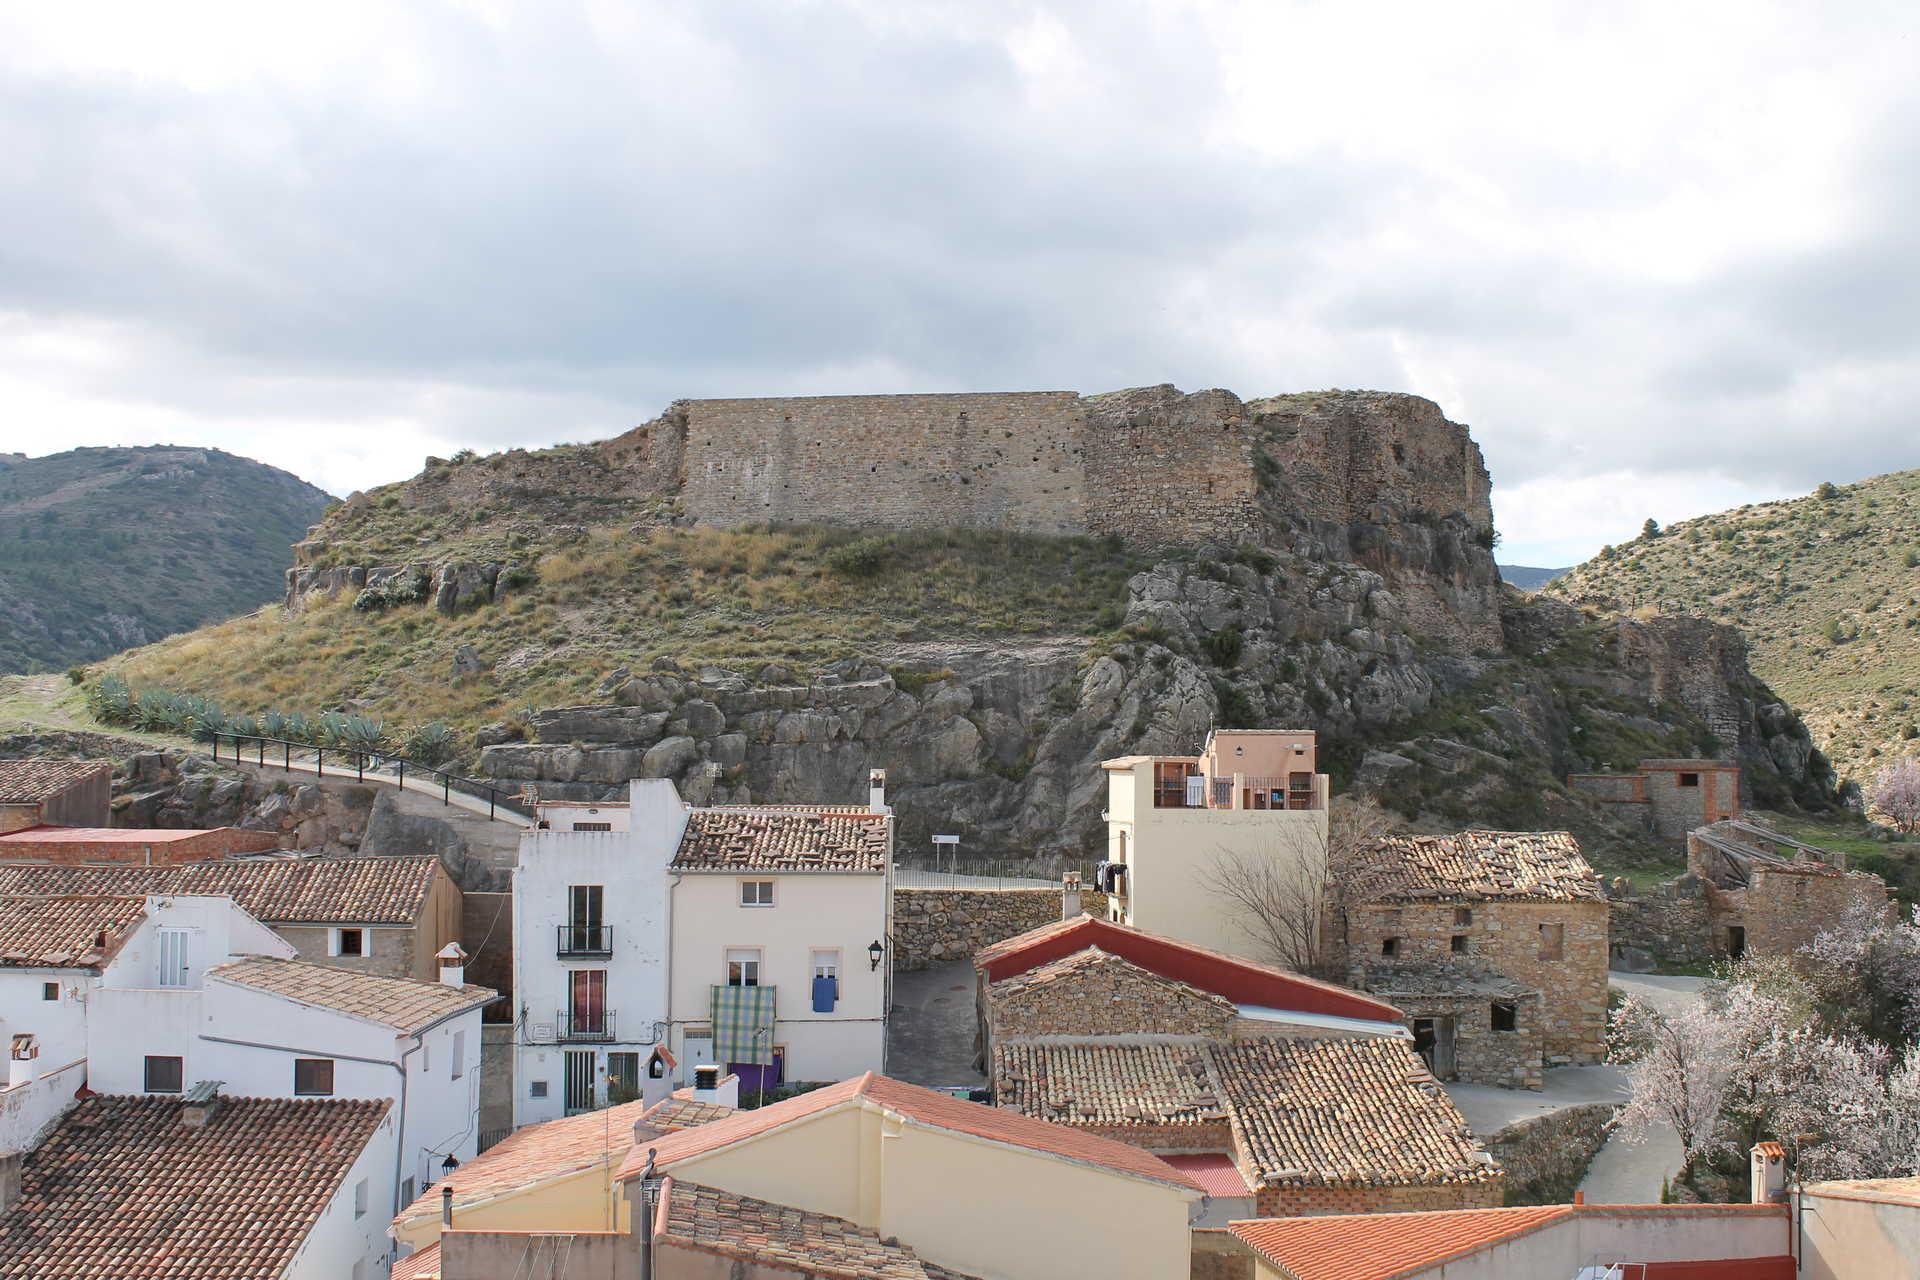 Castillo de la Orden de Calatrava